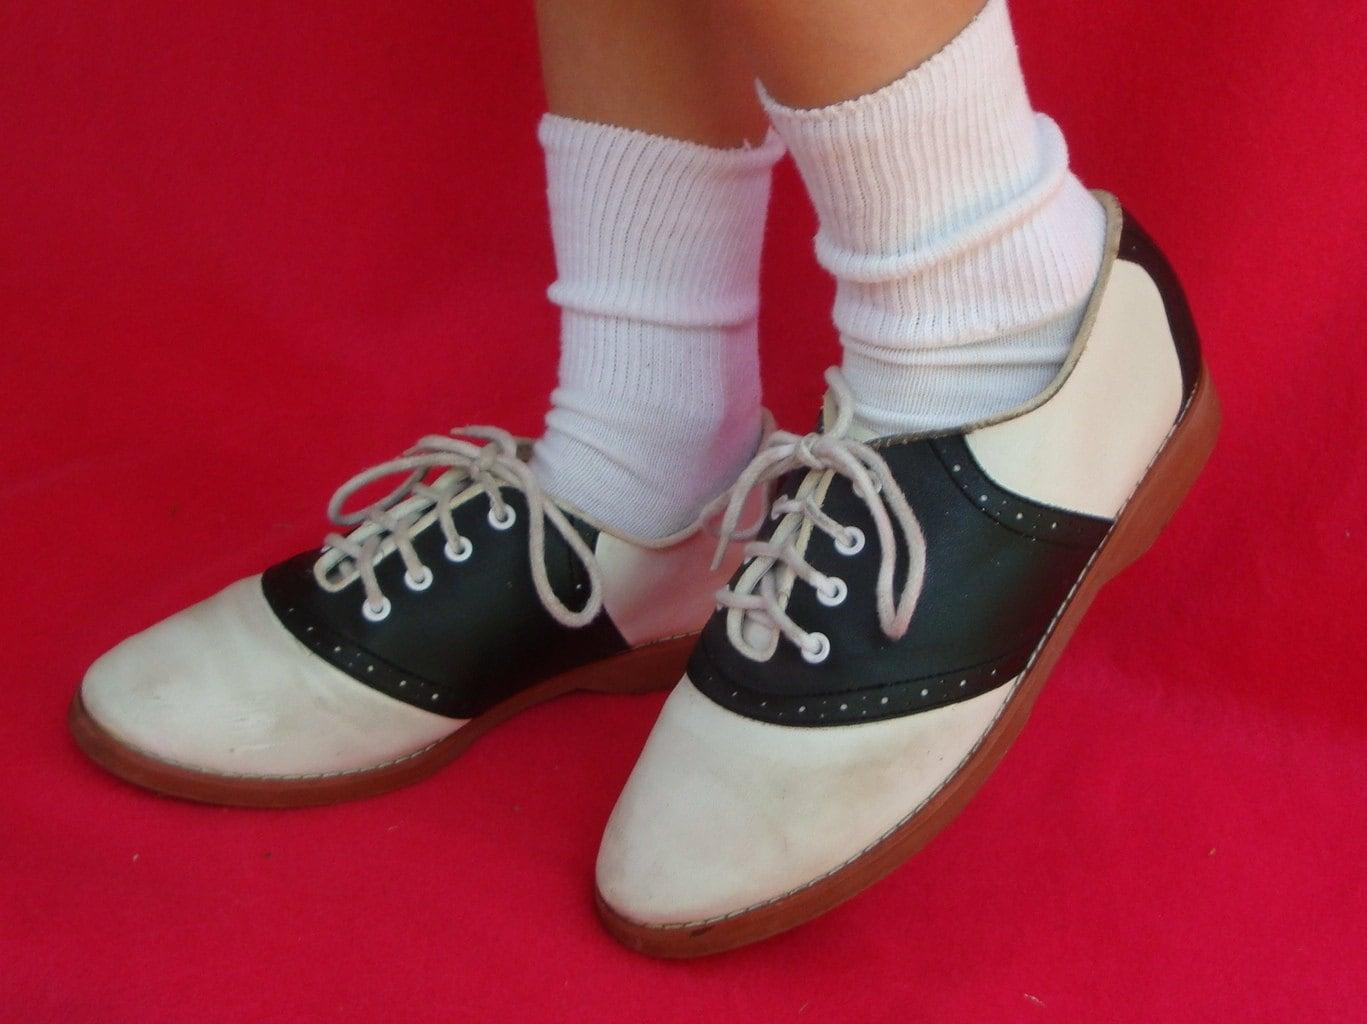 Vintage Vegan Saddle Shoes Black And White Cheerleader